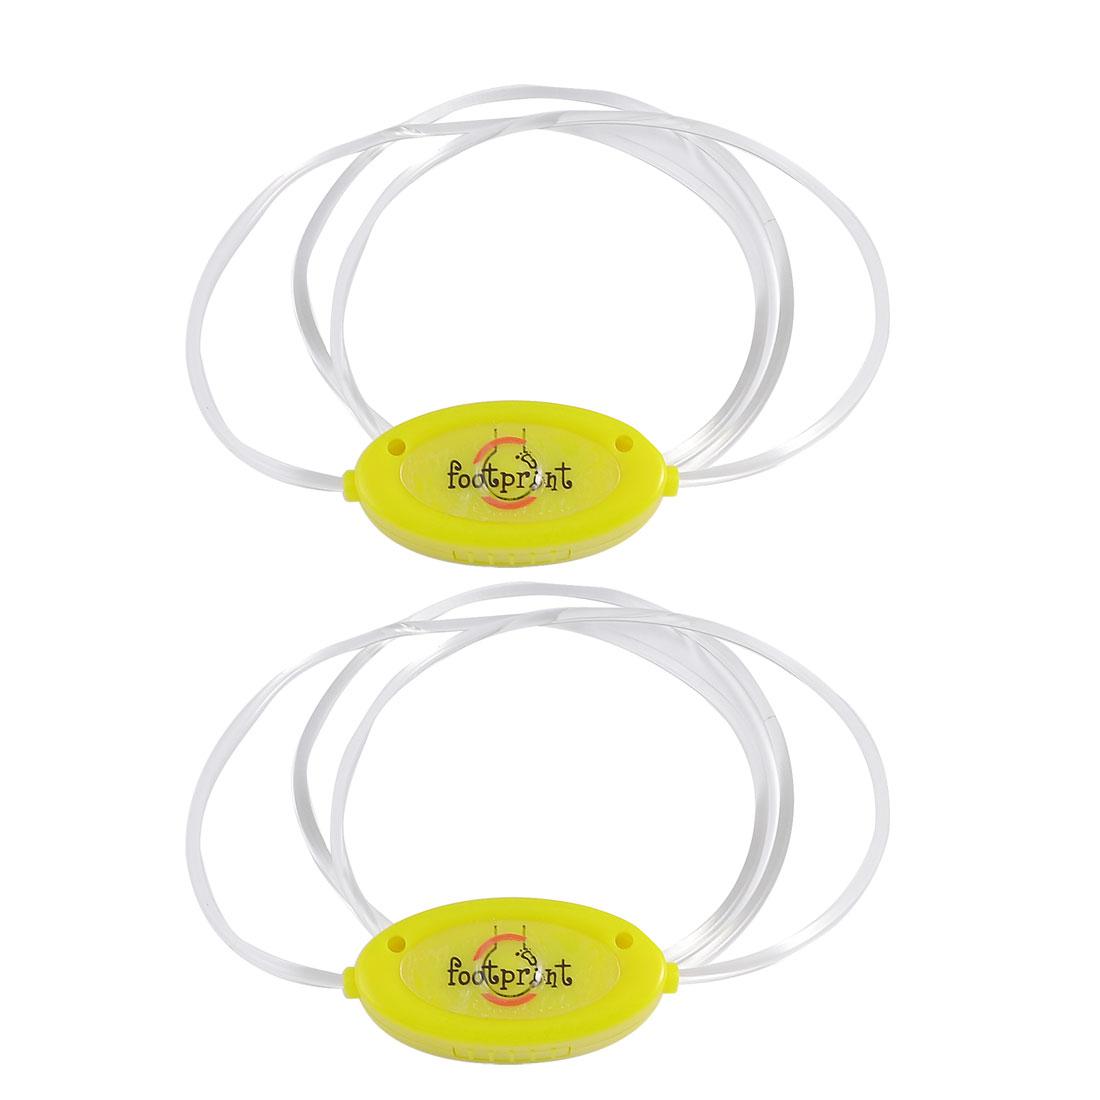 2pcs 3 Mode Yellow LED Light-up Shoe Shoelaces Shoestring Flash Glow Stick Straps